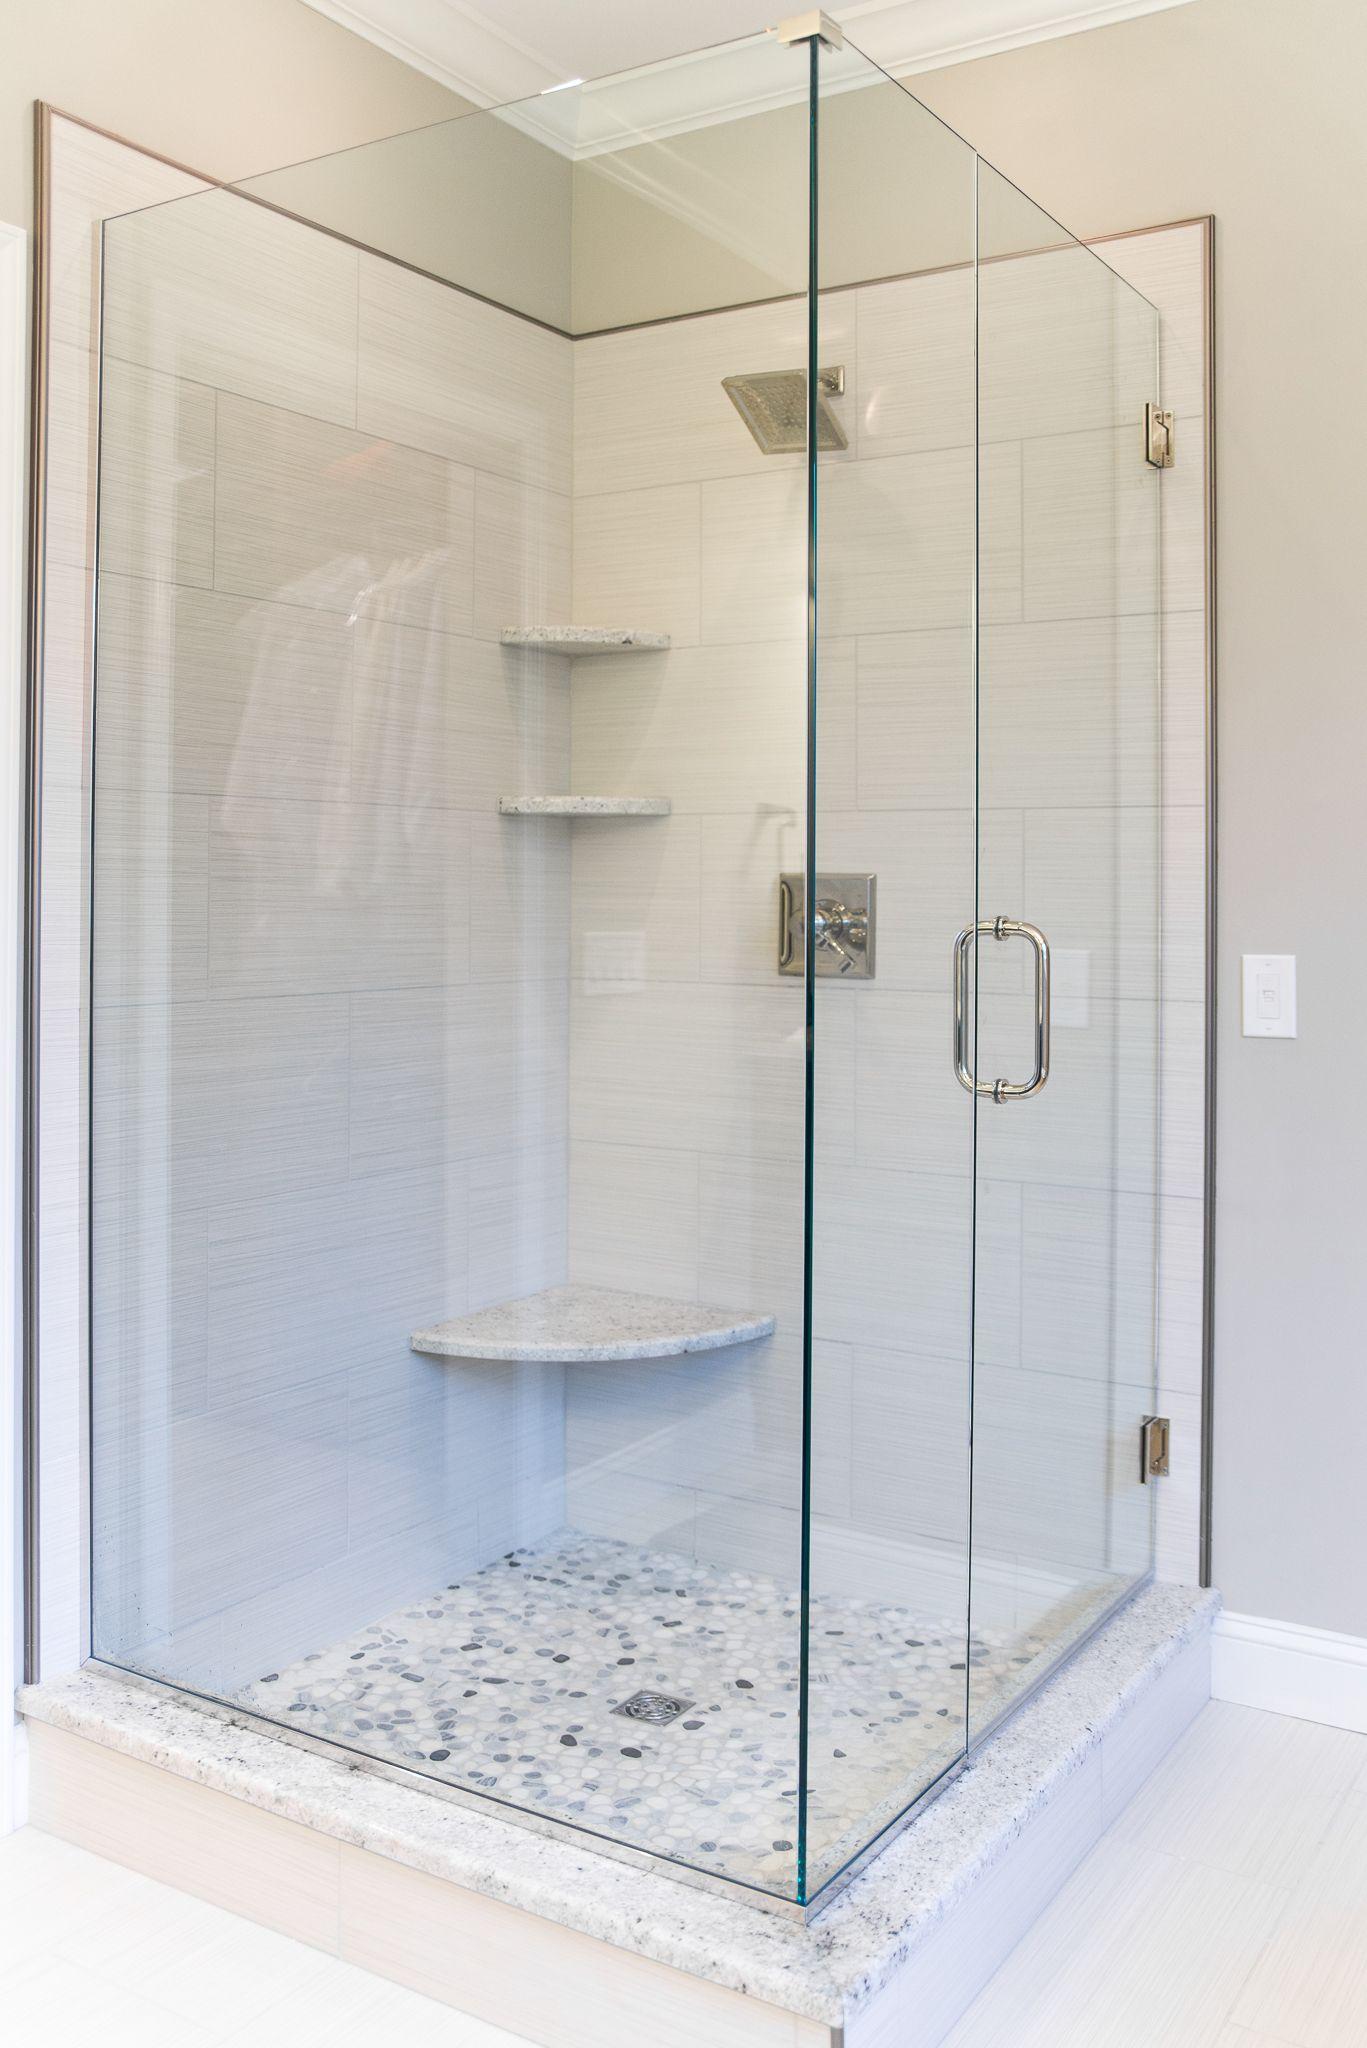 Euro Glass - 12x24 striated porcelain - River rock shower - LZ ...